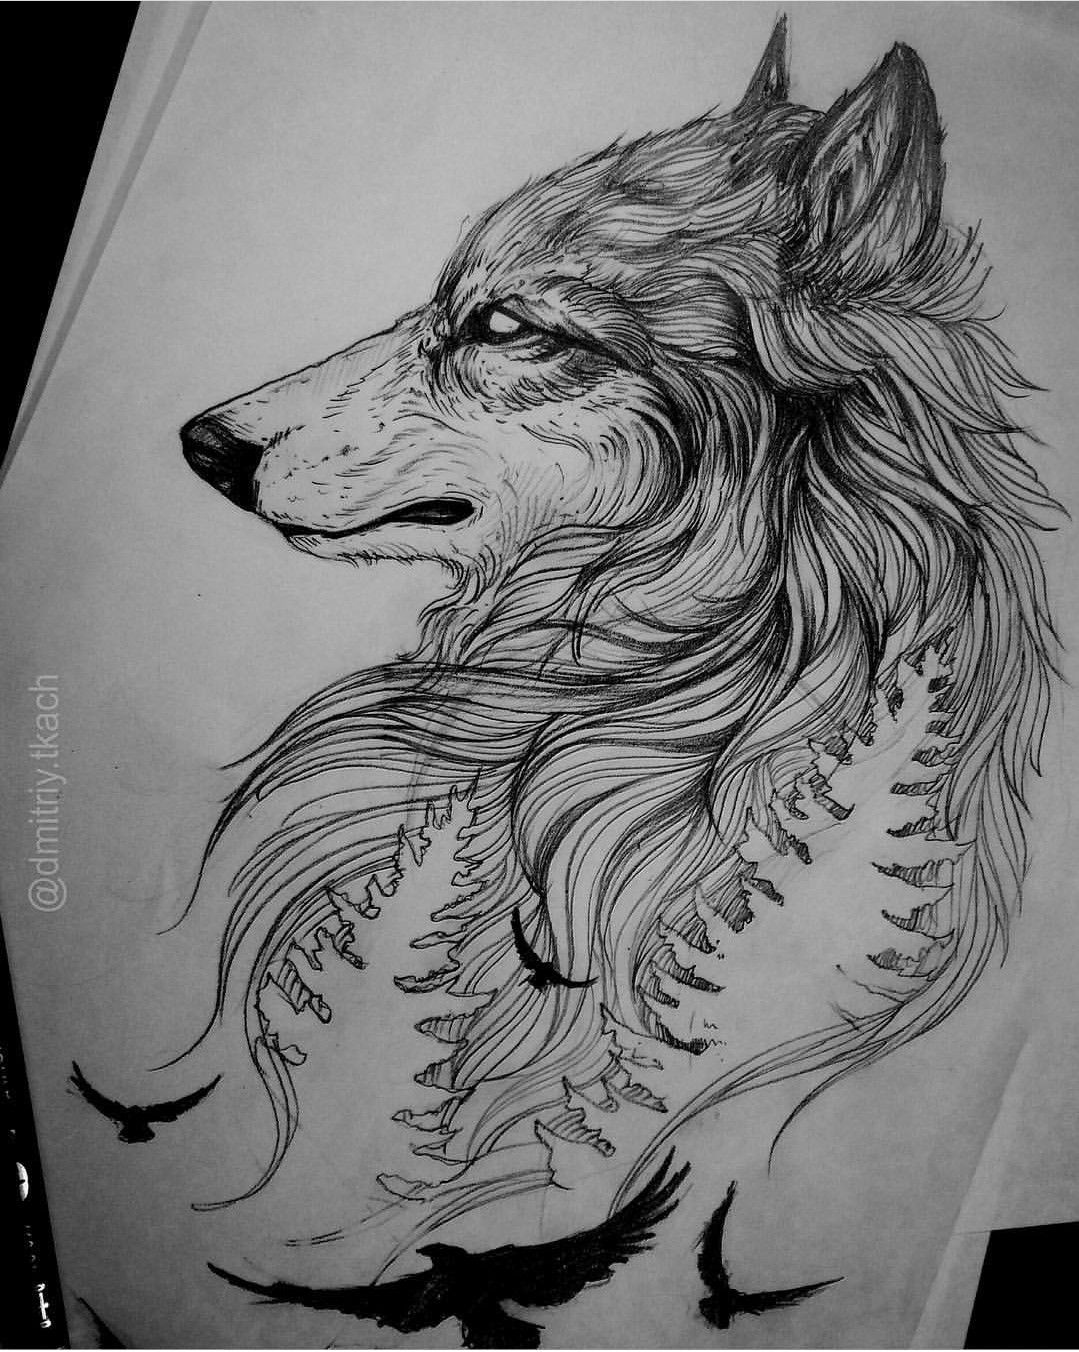 Pin De Emanuel Mdfk En Tatuajes Tatuajes De Lobos Esbozo De